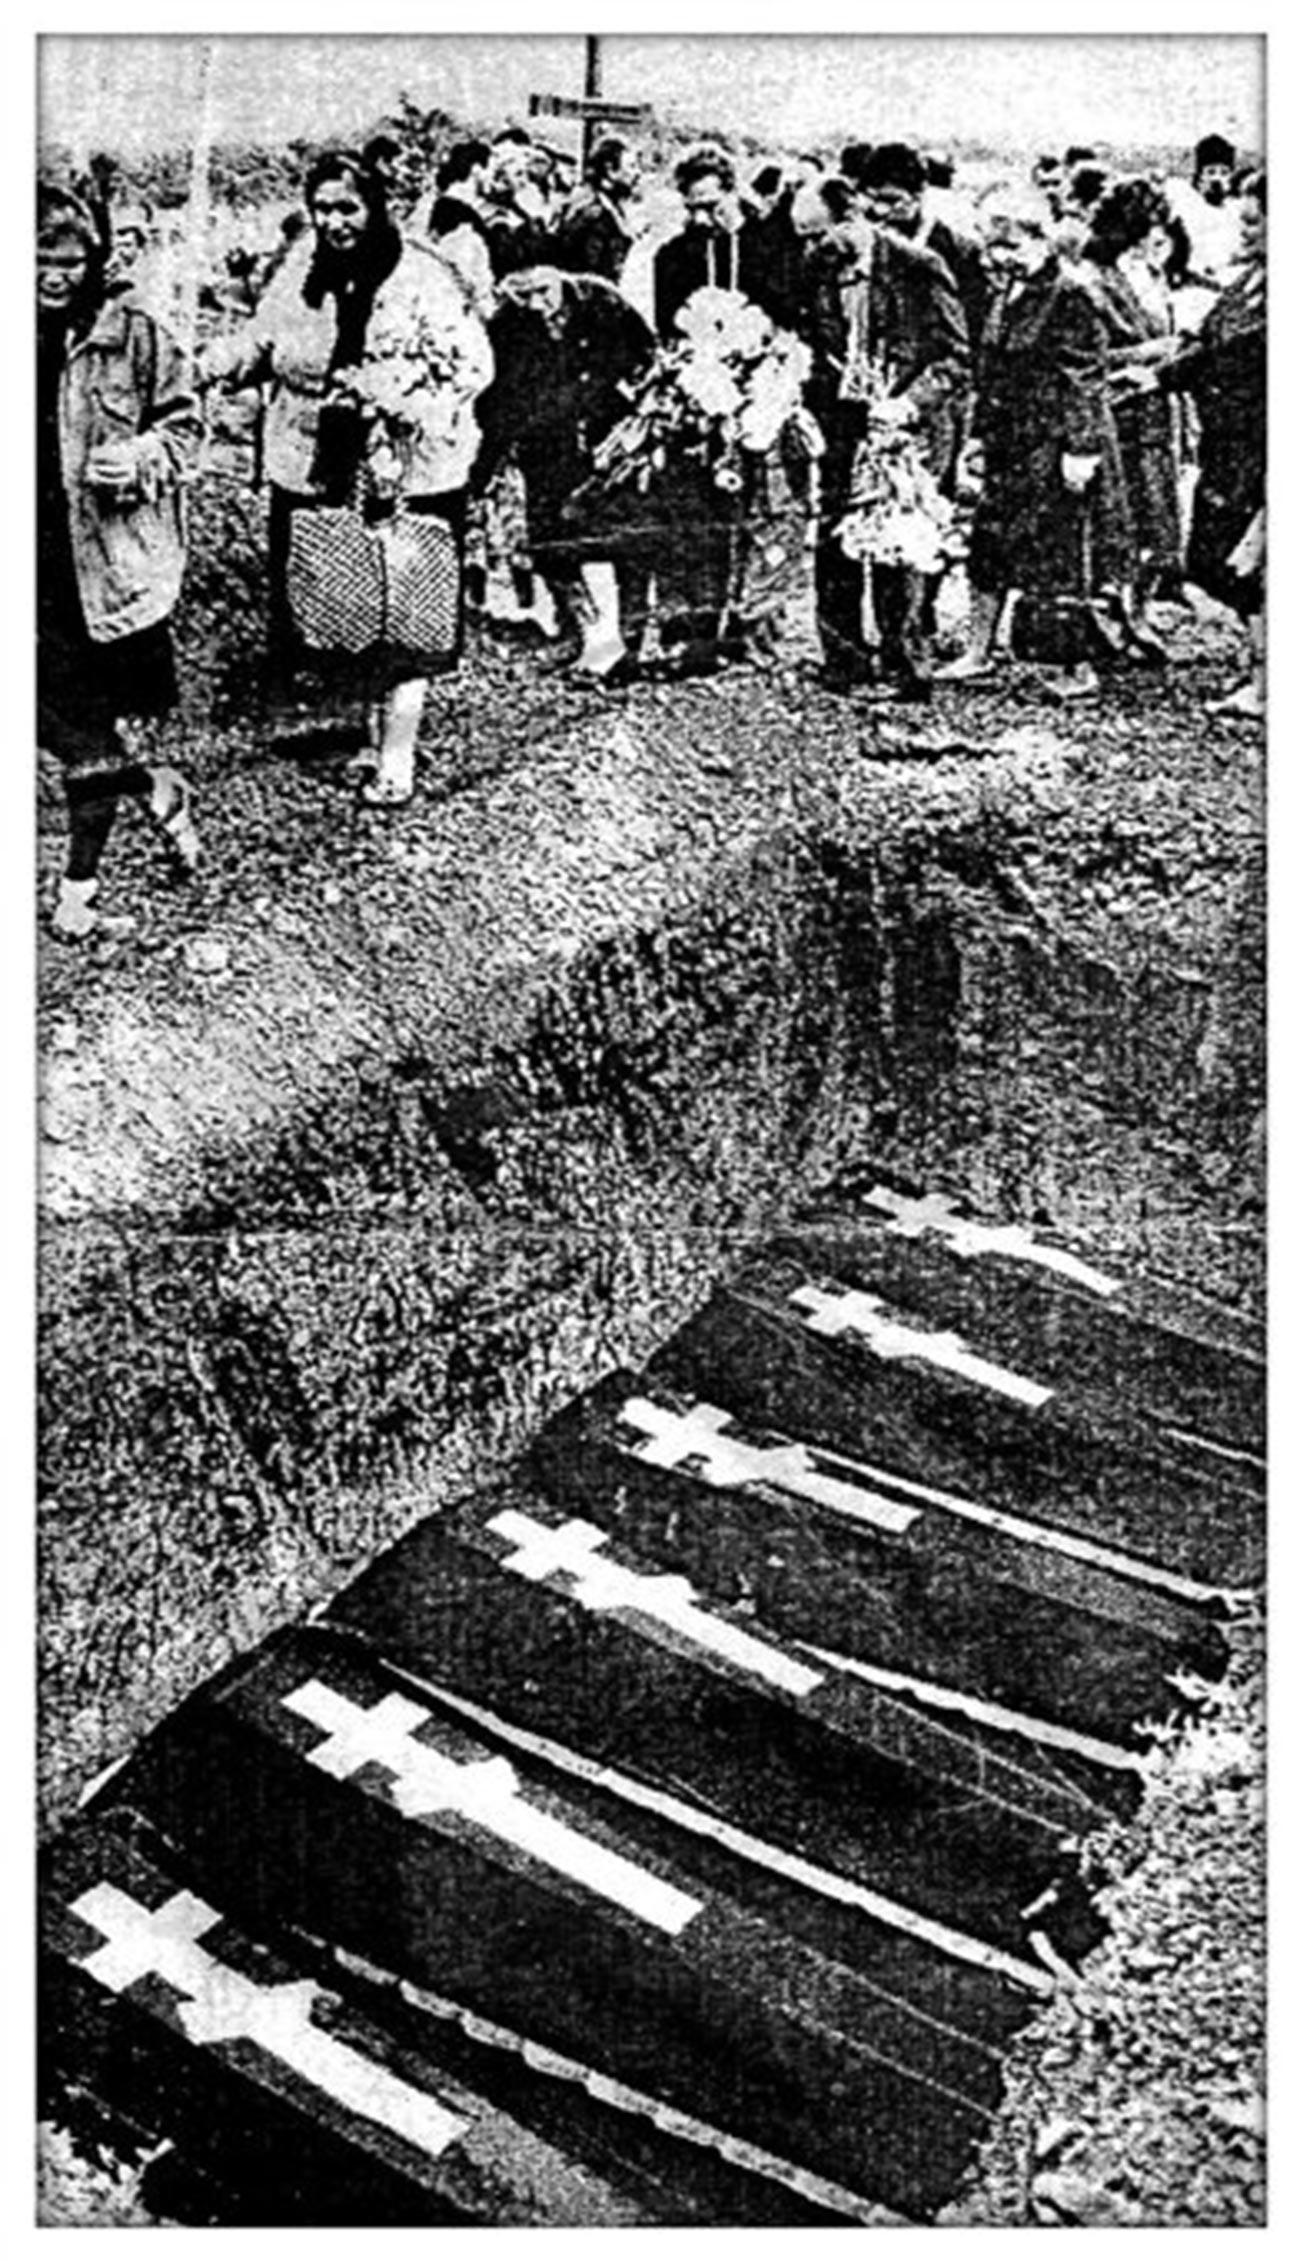 Ponovna sahrana ekshumiranih posmrtnih ostataka žrtava novočerkaske tragedije iz 1962. godine, Miškinsko groblje.